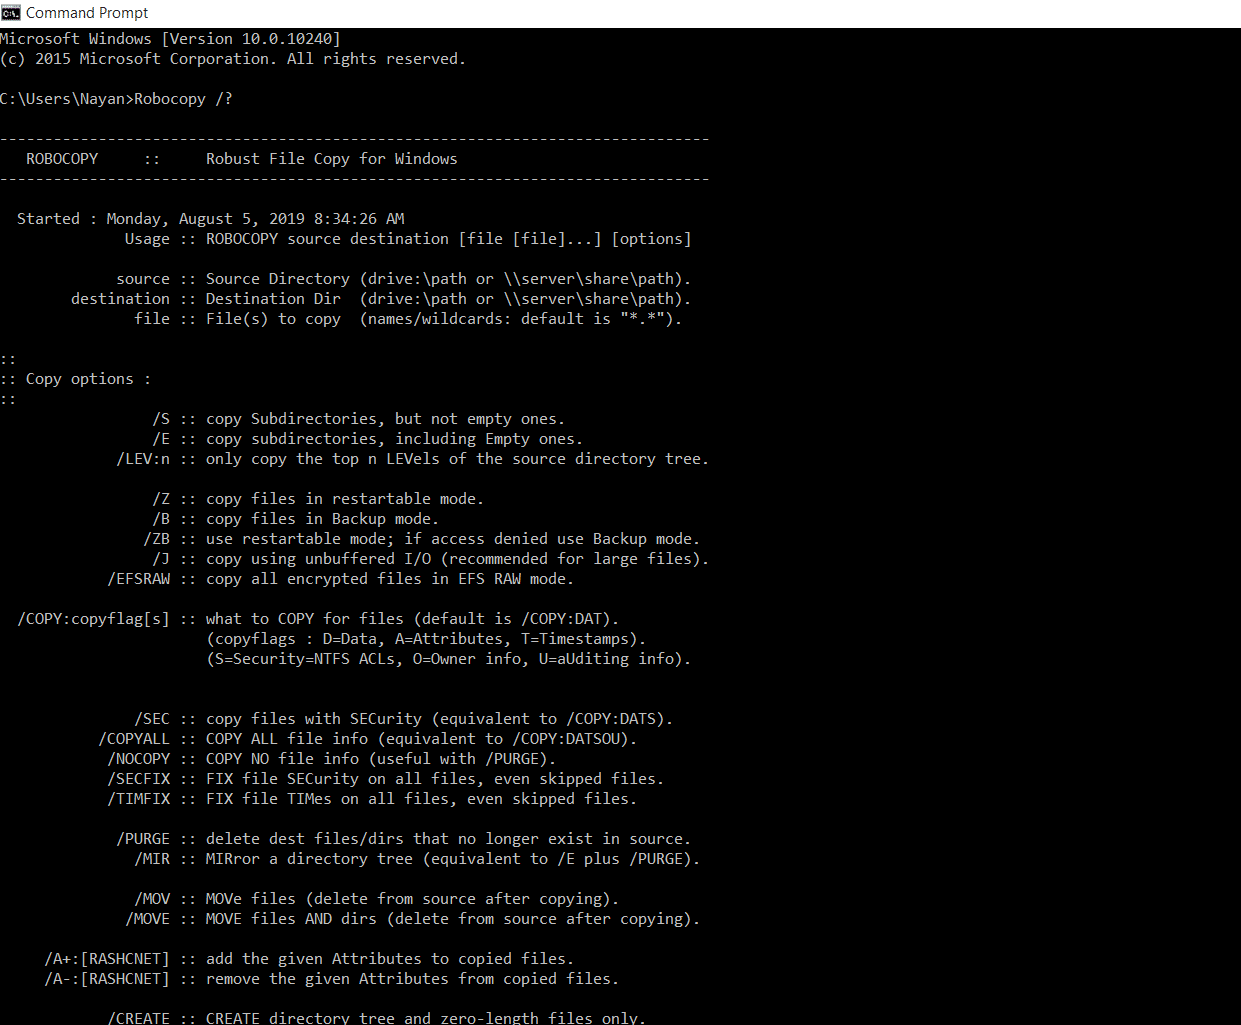 robocopy one file